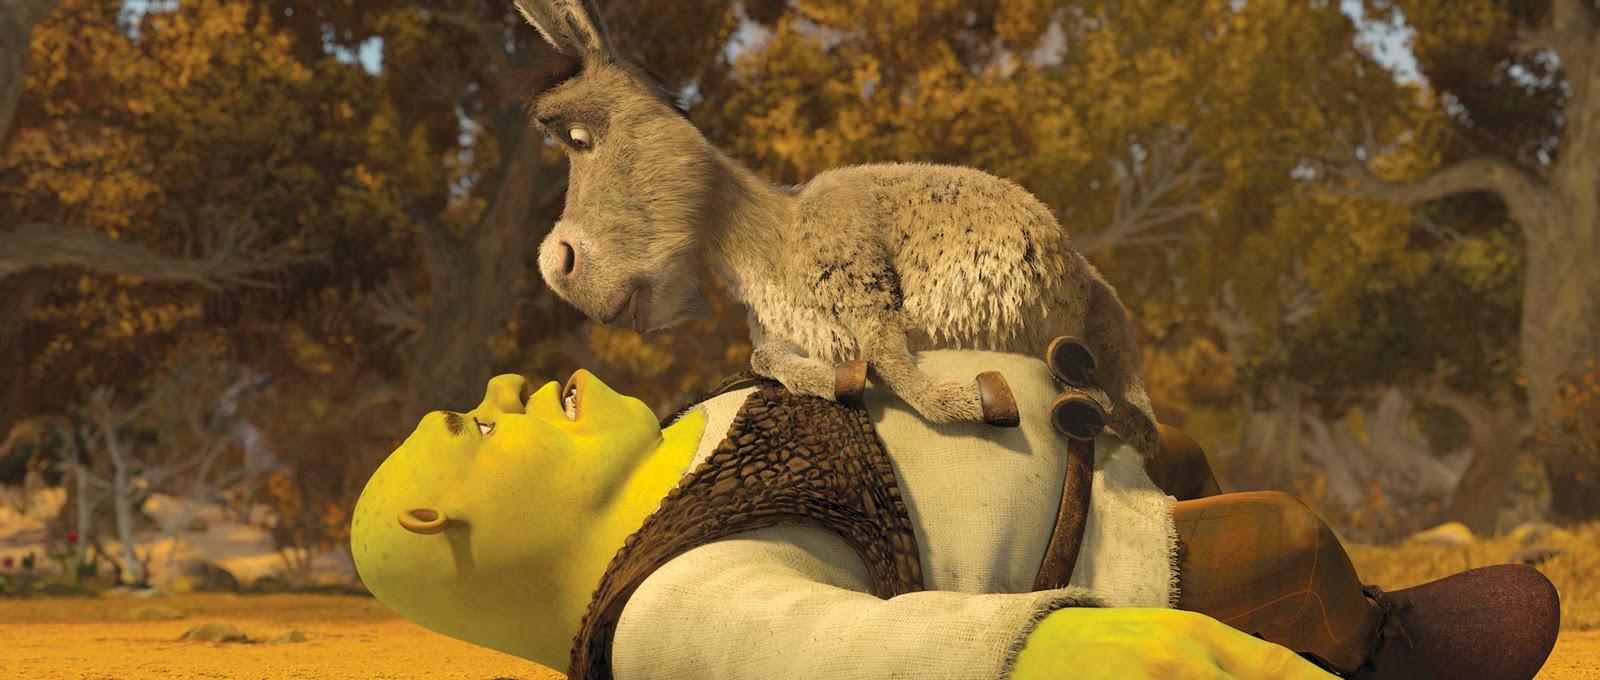 Shrek e o Burro